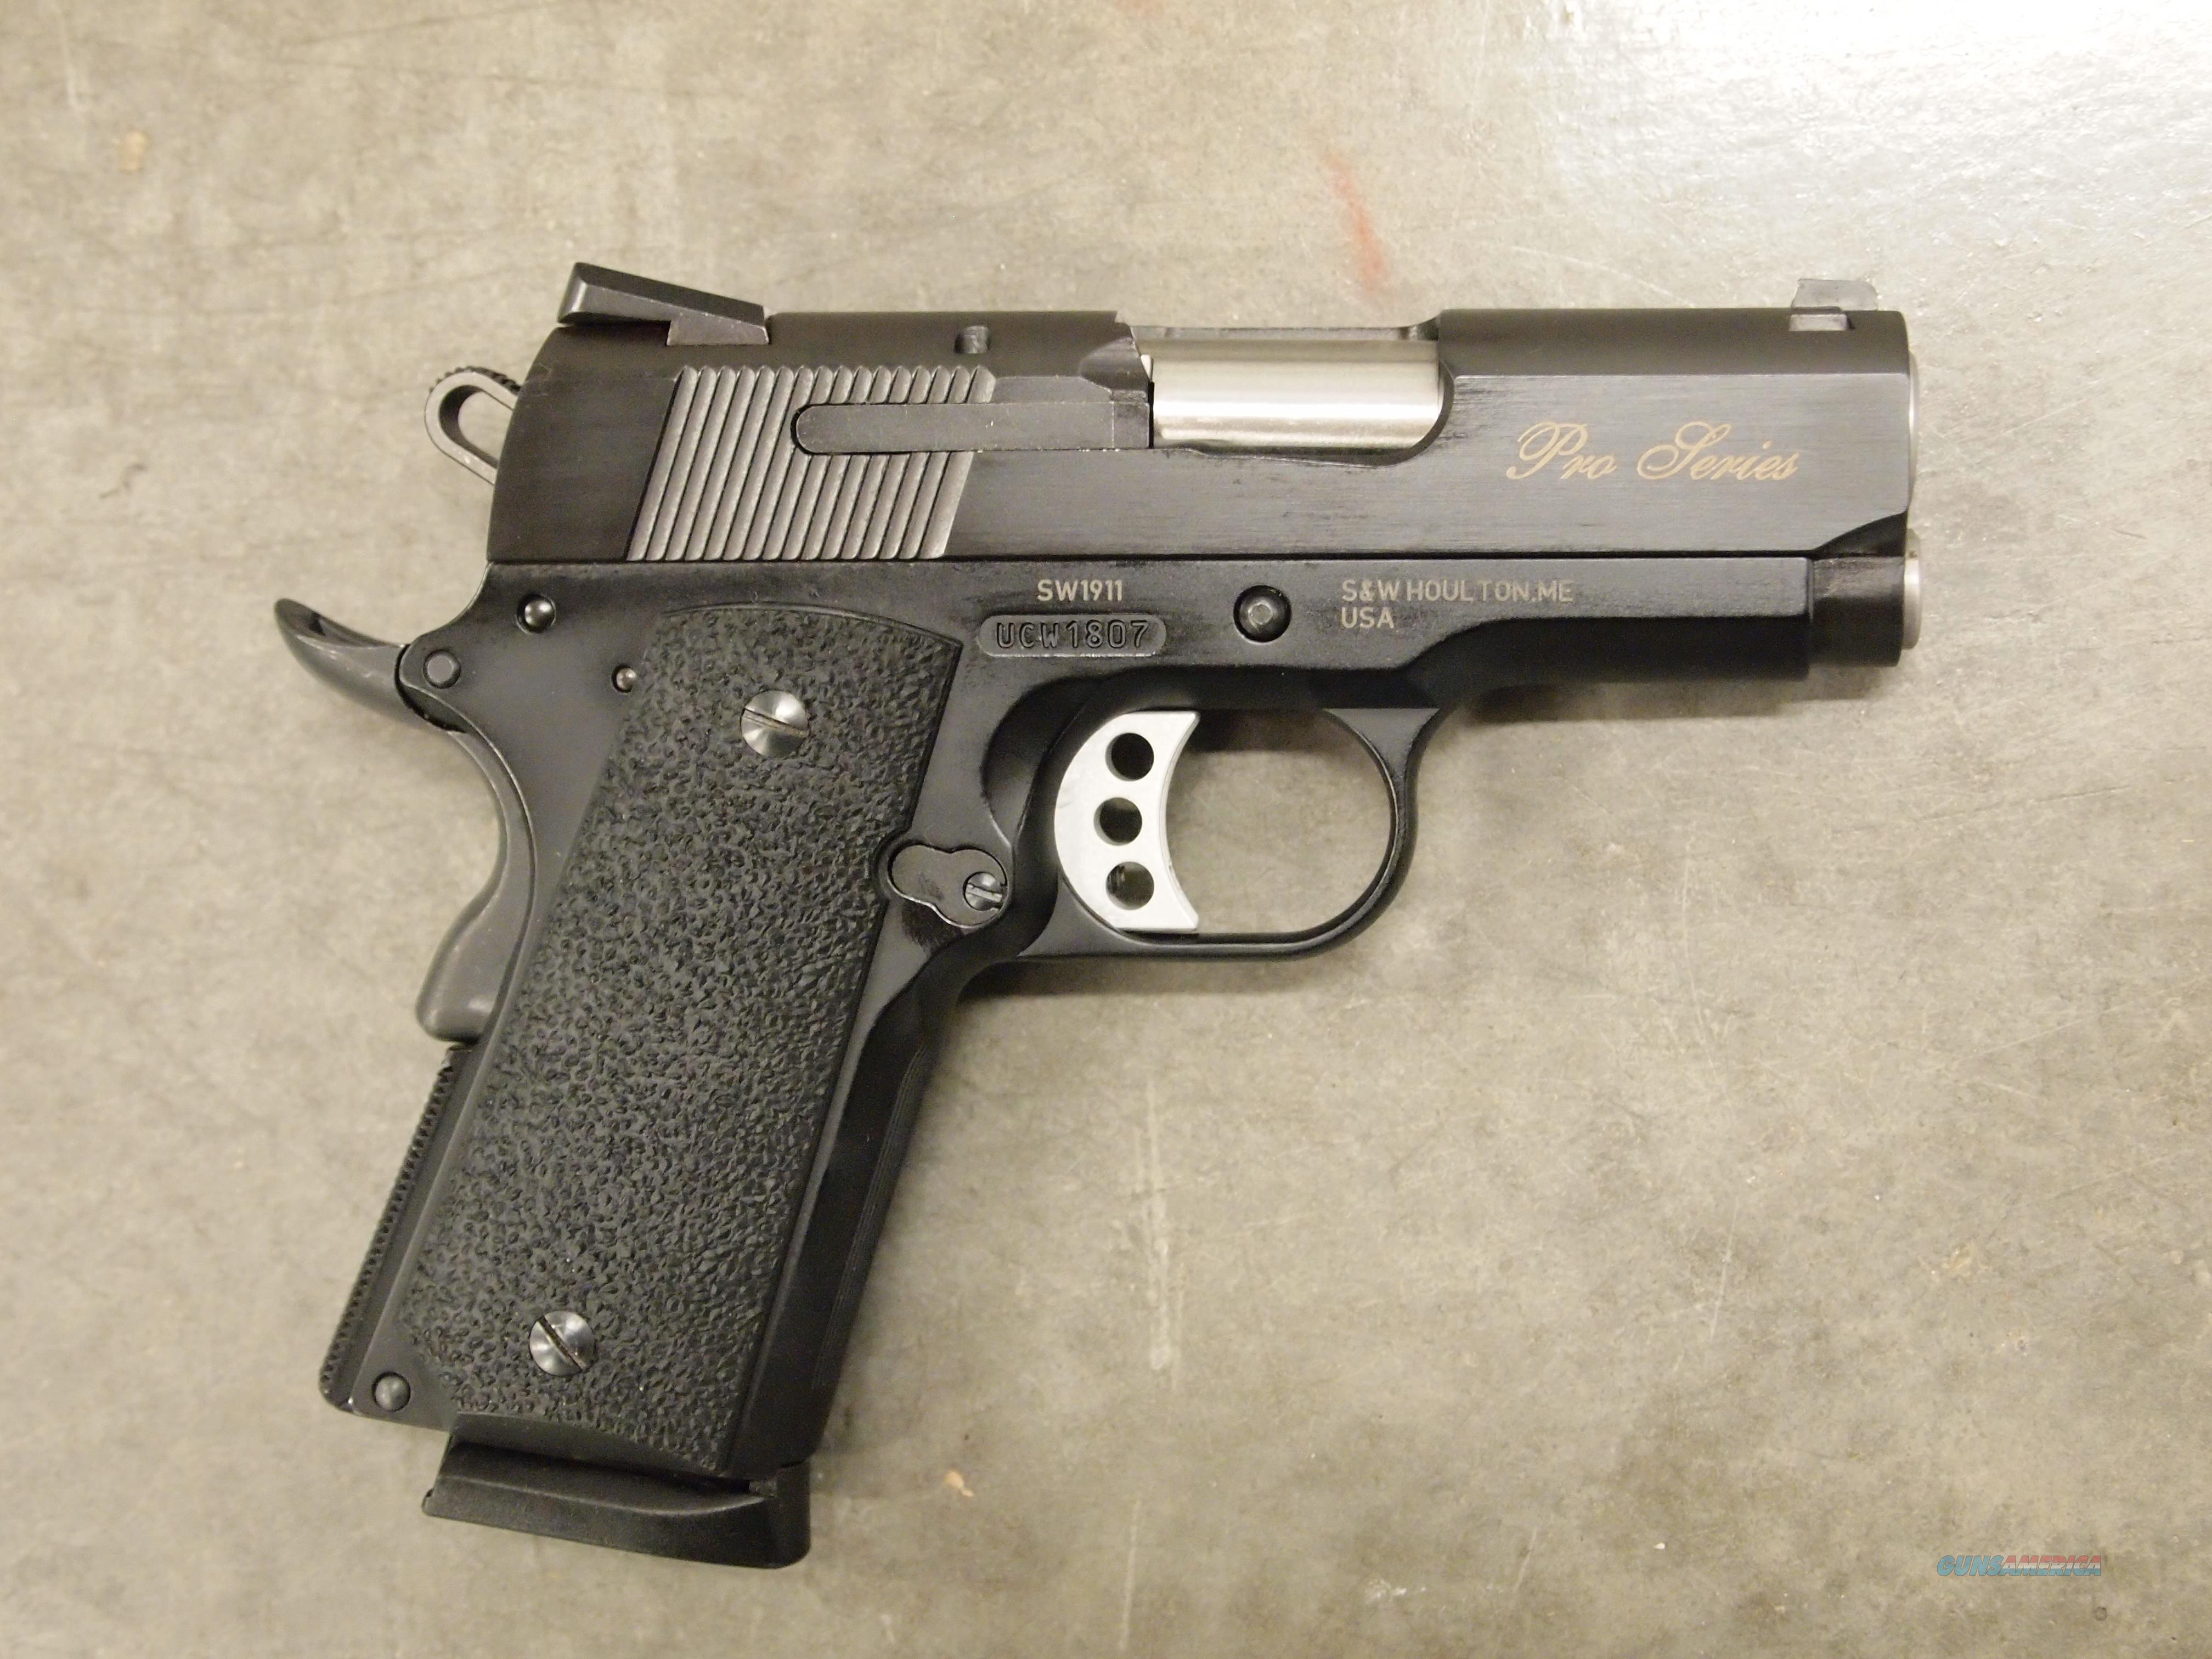 Smith & Wesson SW1911 Subcompact  45 ACP